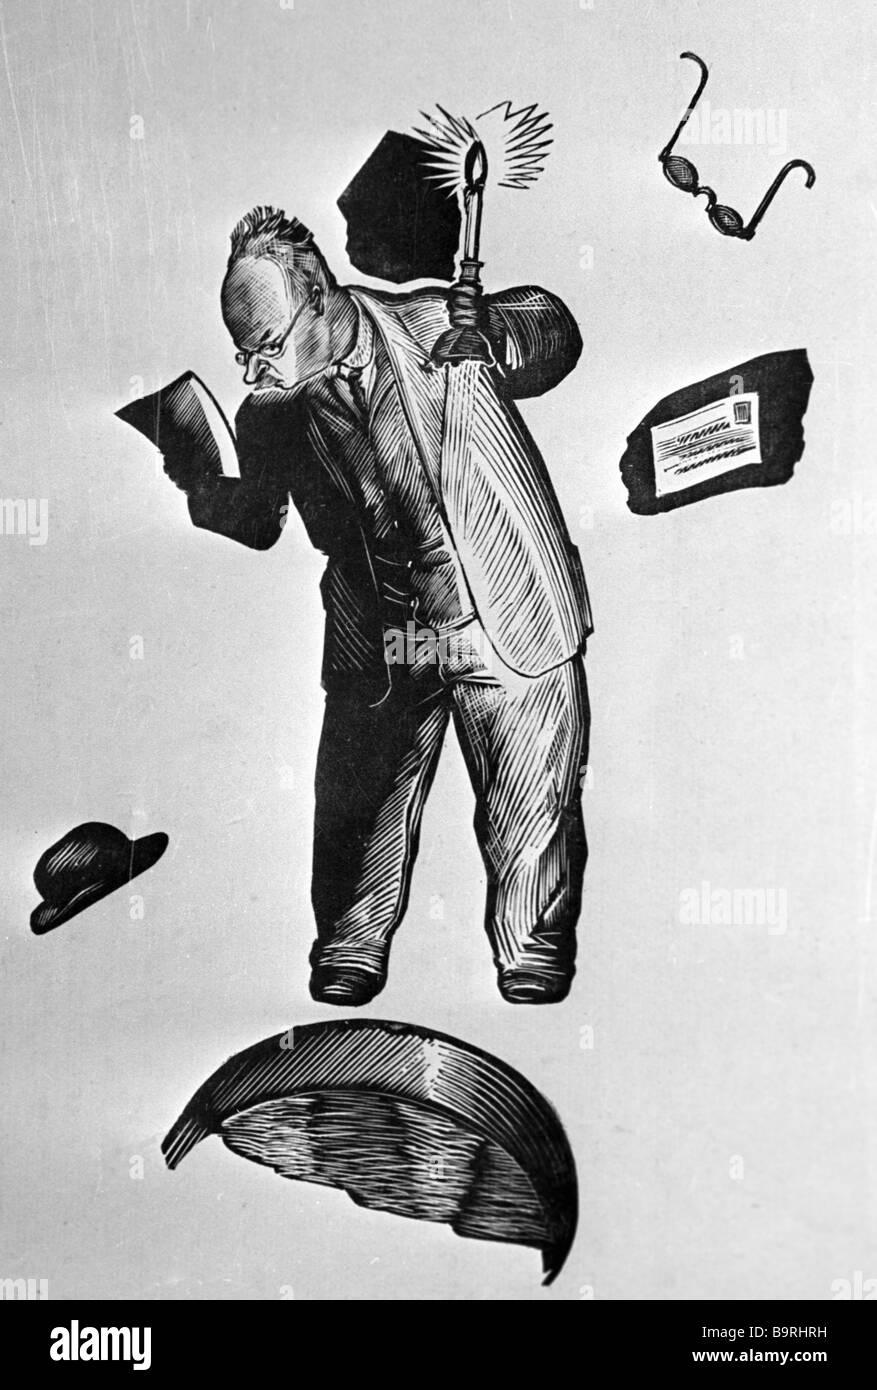 Andrei Goncharov Portrait of actor Maxim Shtraukh 1932 - Stock Image